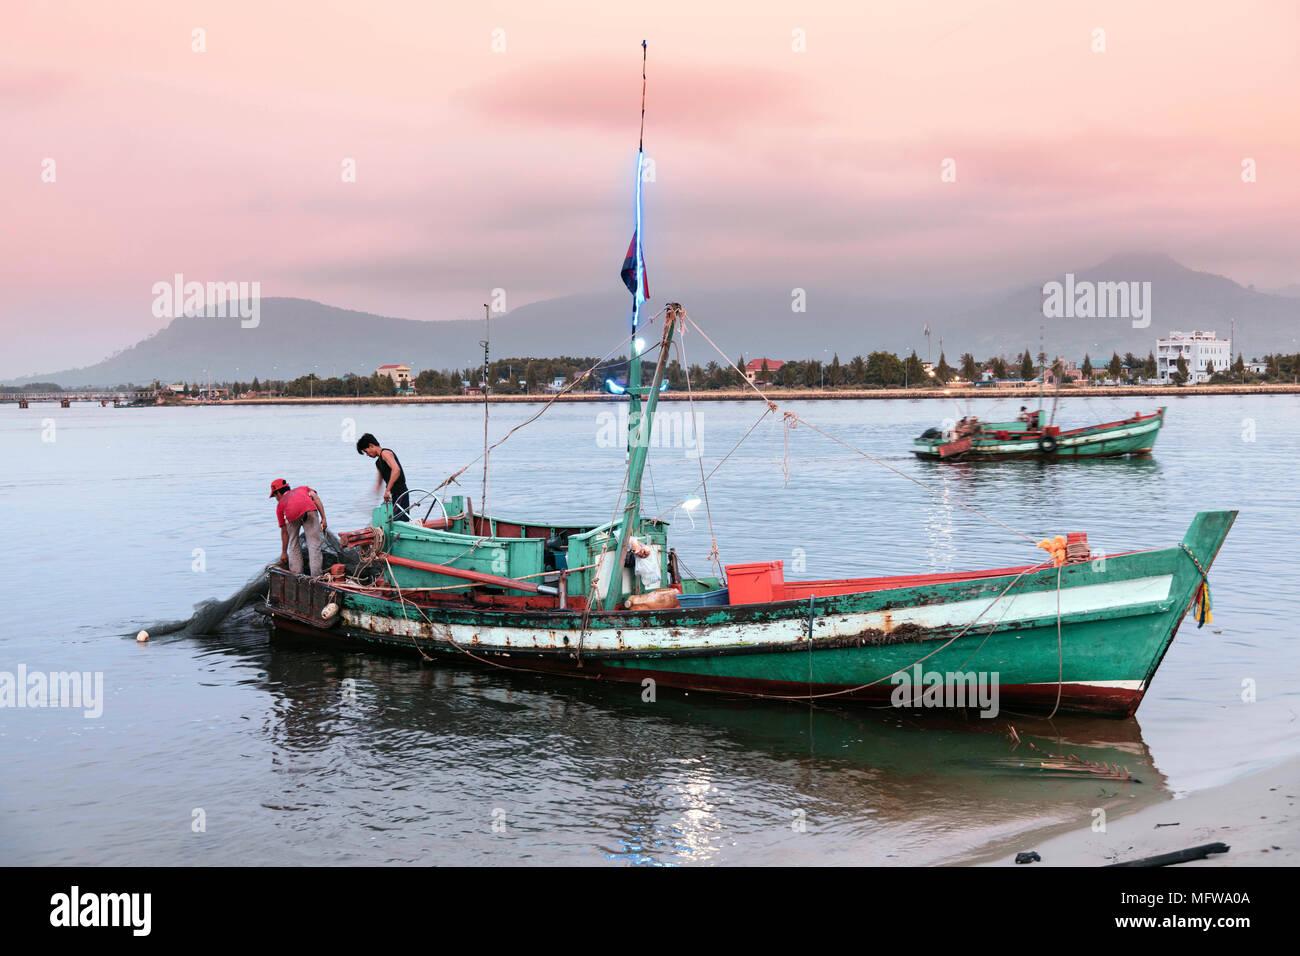 Bateaux de pêche sur la rivière Preaek Tuek Chhu à Kampot ville Photo Stock